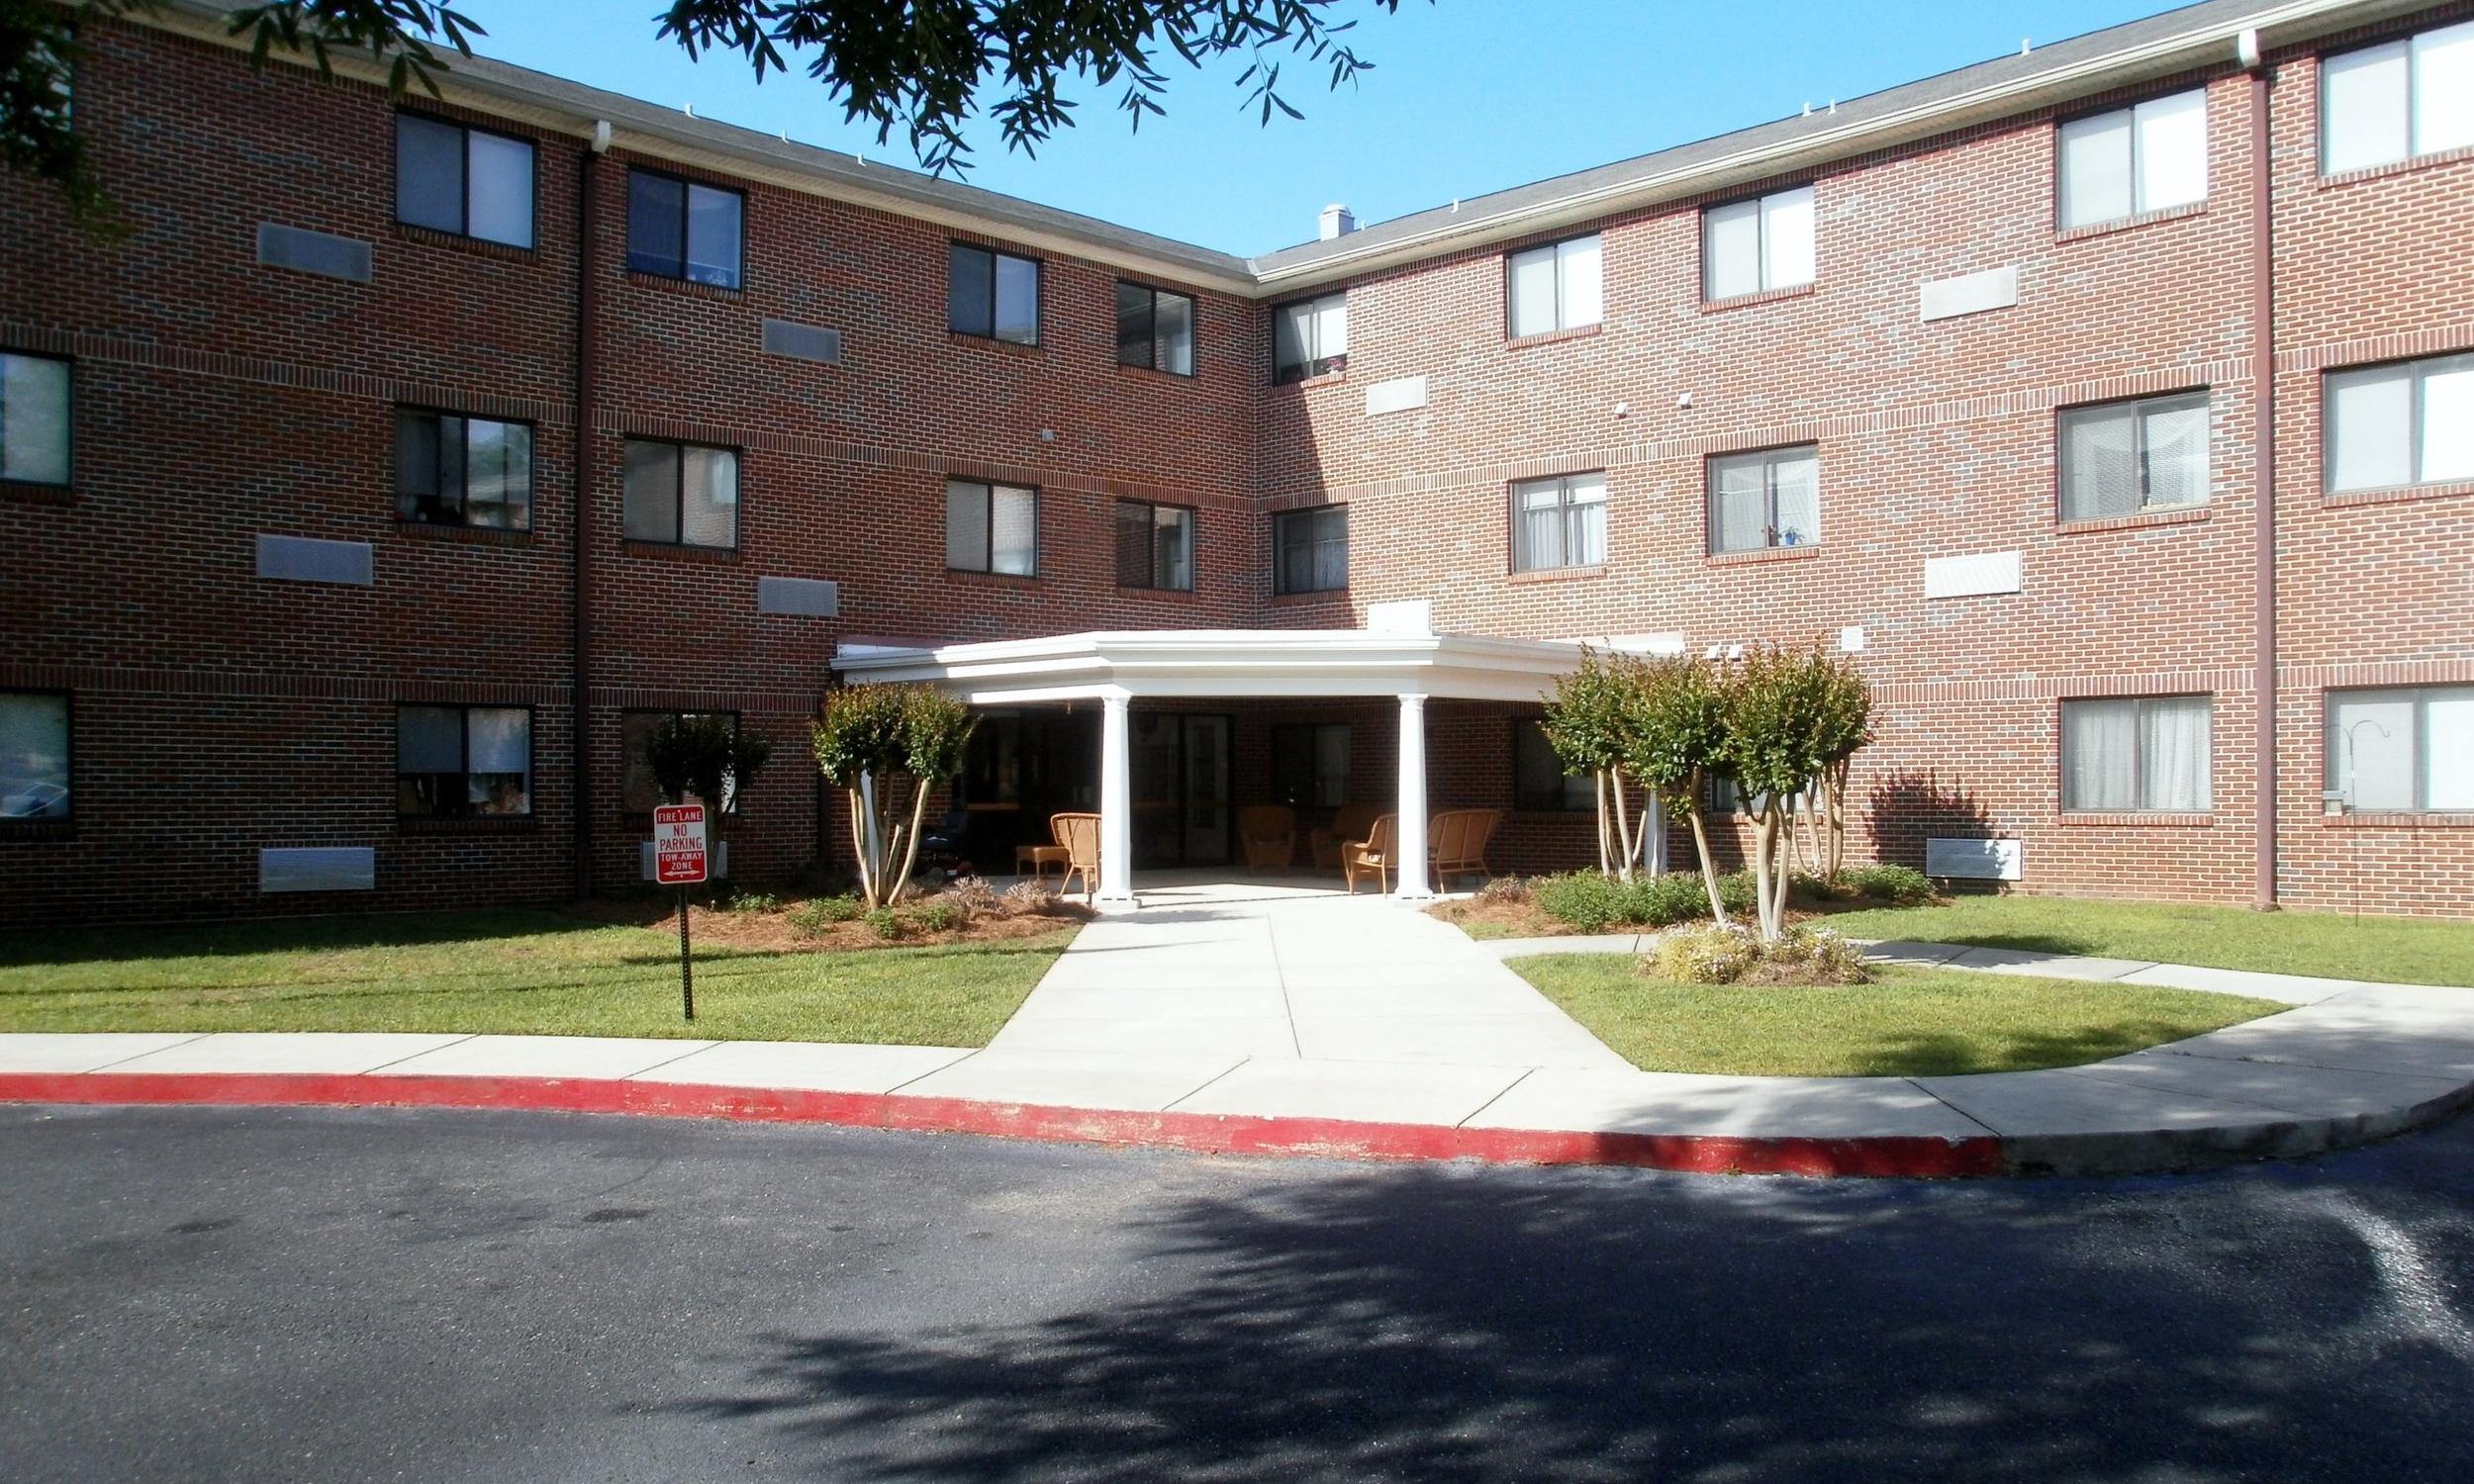 AHEPA 310 VI Senior Apartments - 5223 Cottage HillMobile, AL 36609(251) 665-9026 TTY: (800) 421-1220 or 711 (English)TTY: (800) 676-4290 or 711 (Español)info@ahepahousing.org